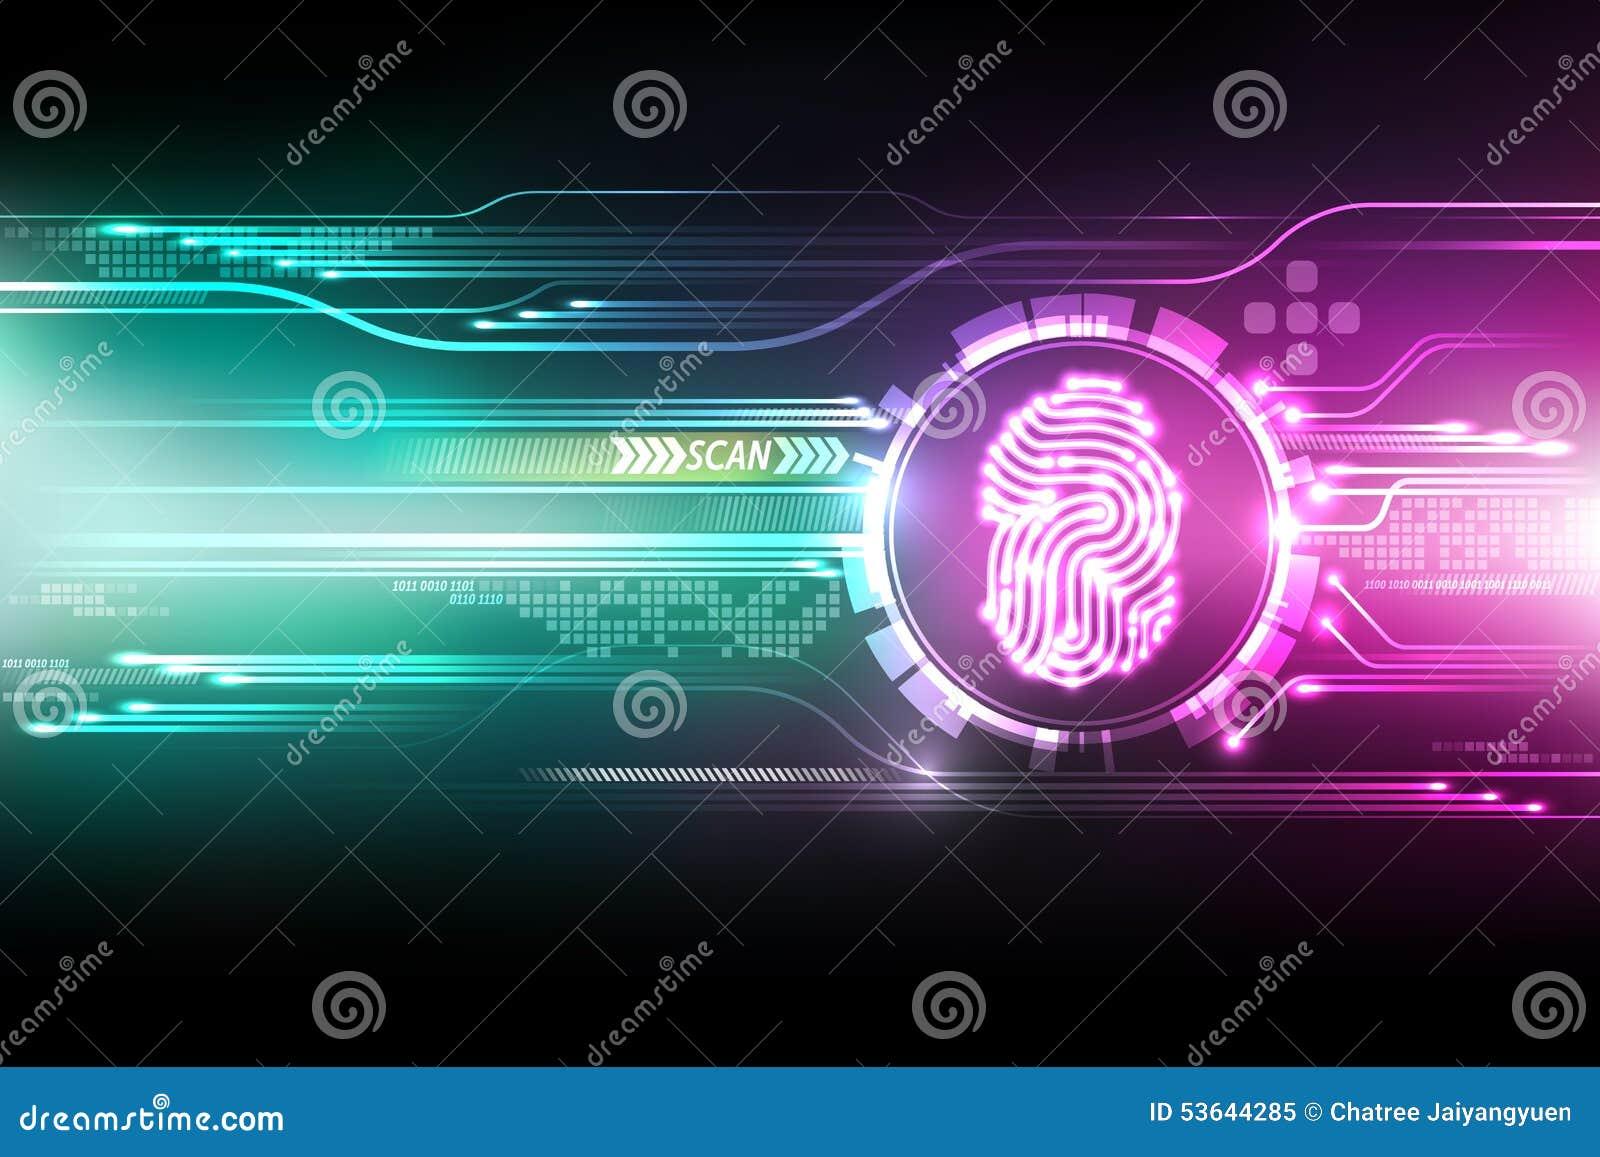 Abstract Technology Background Security System Concept Fingerprint Letter P Sign Vector Illustration